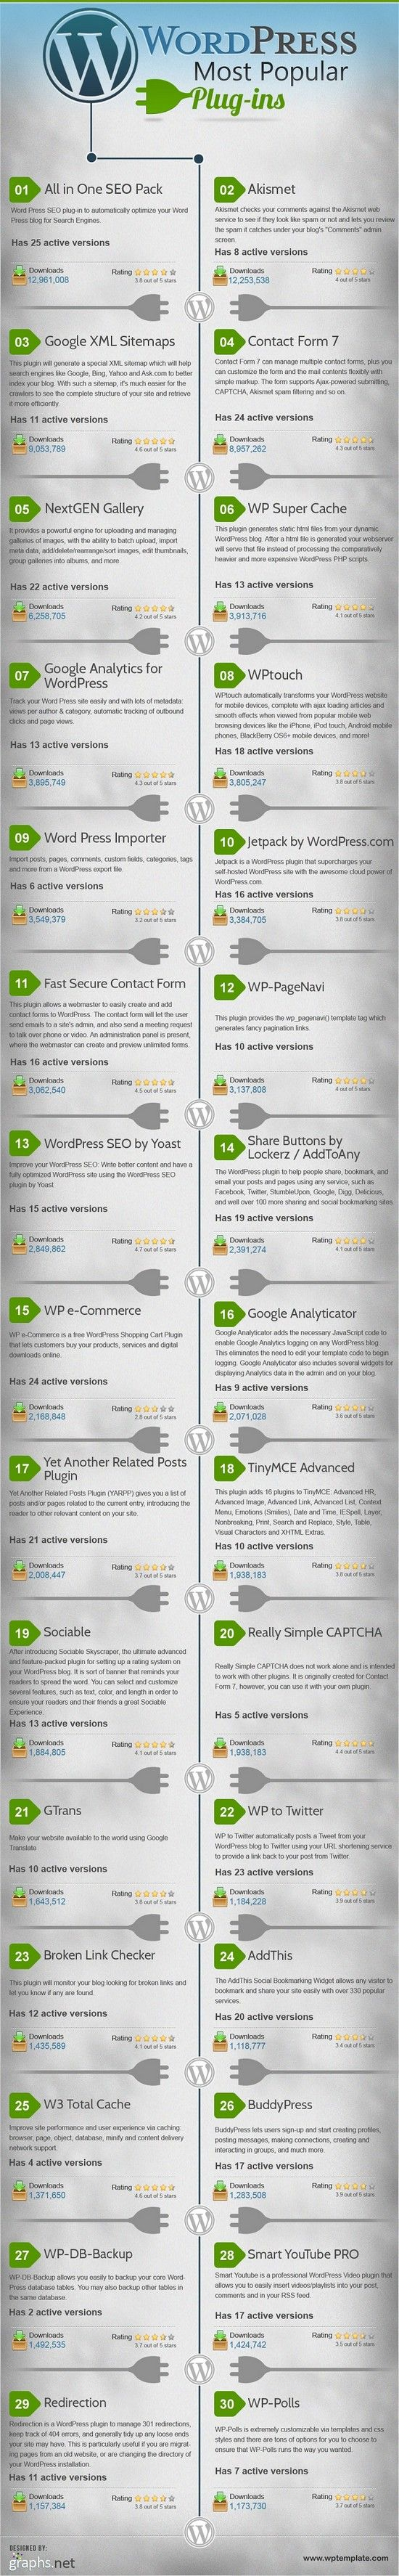 Les plugins wordpress les plus populaires - Xpressionecrite.com